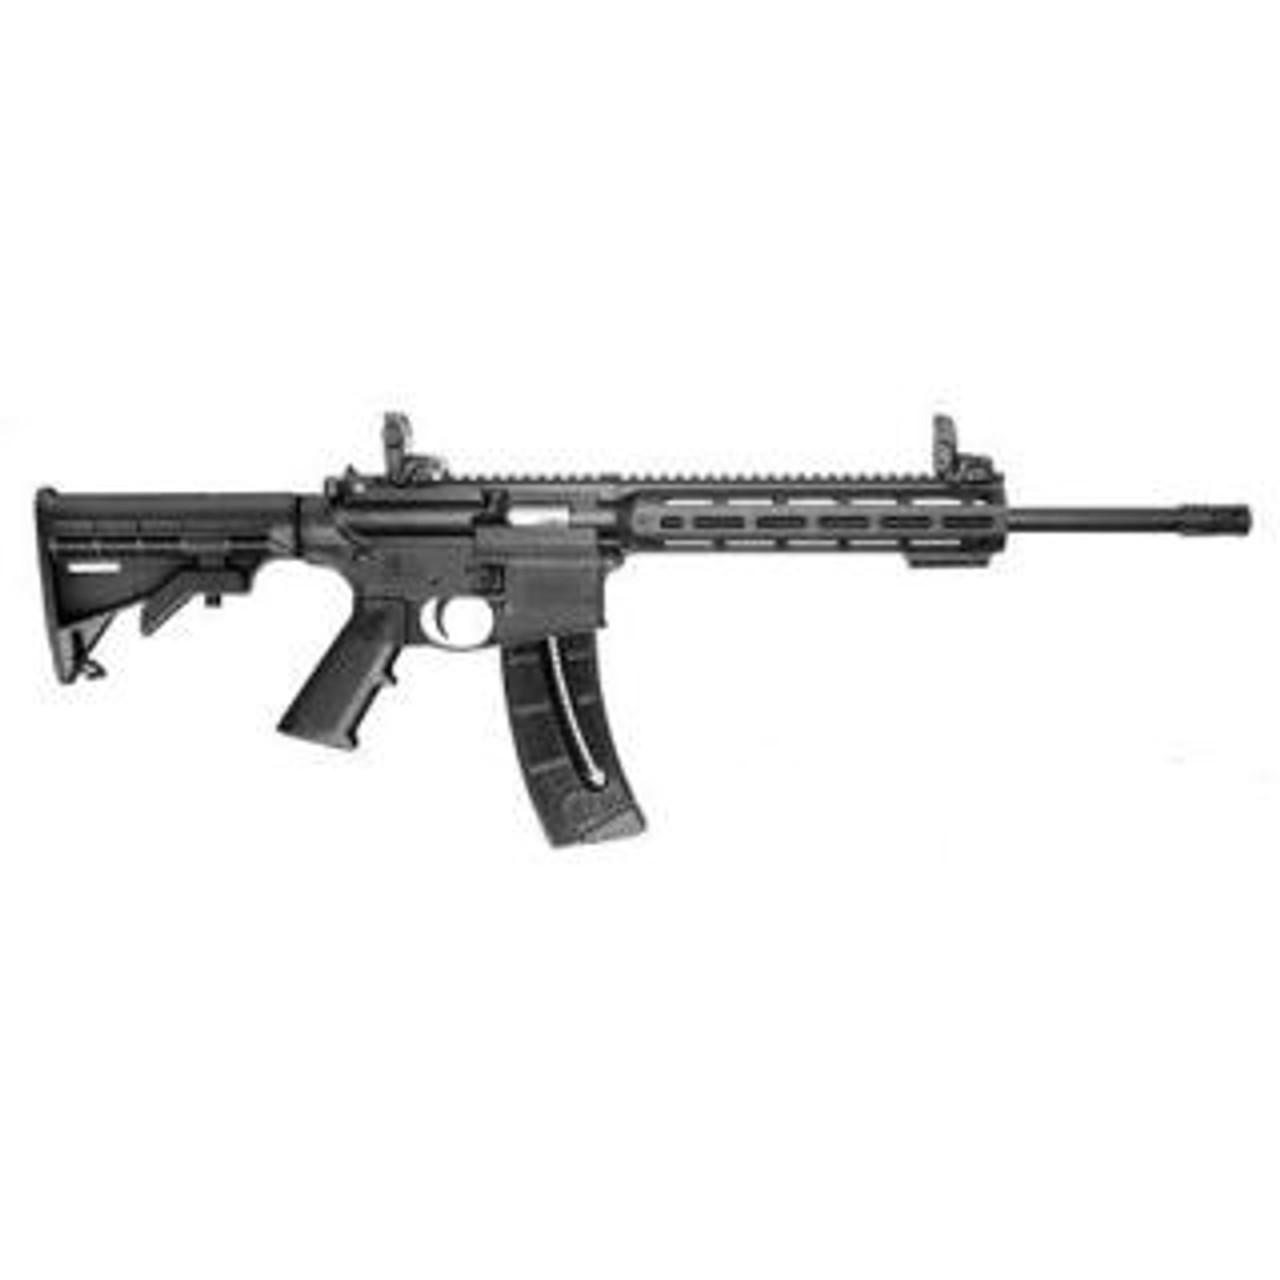 "Smith & Wesson M&P15-22 Sport 16.5"" MBUS CALIFORNIA LEGAL - .22 LR"